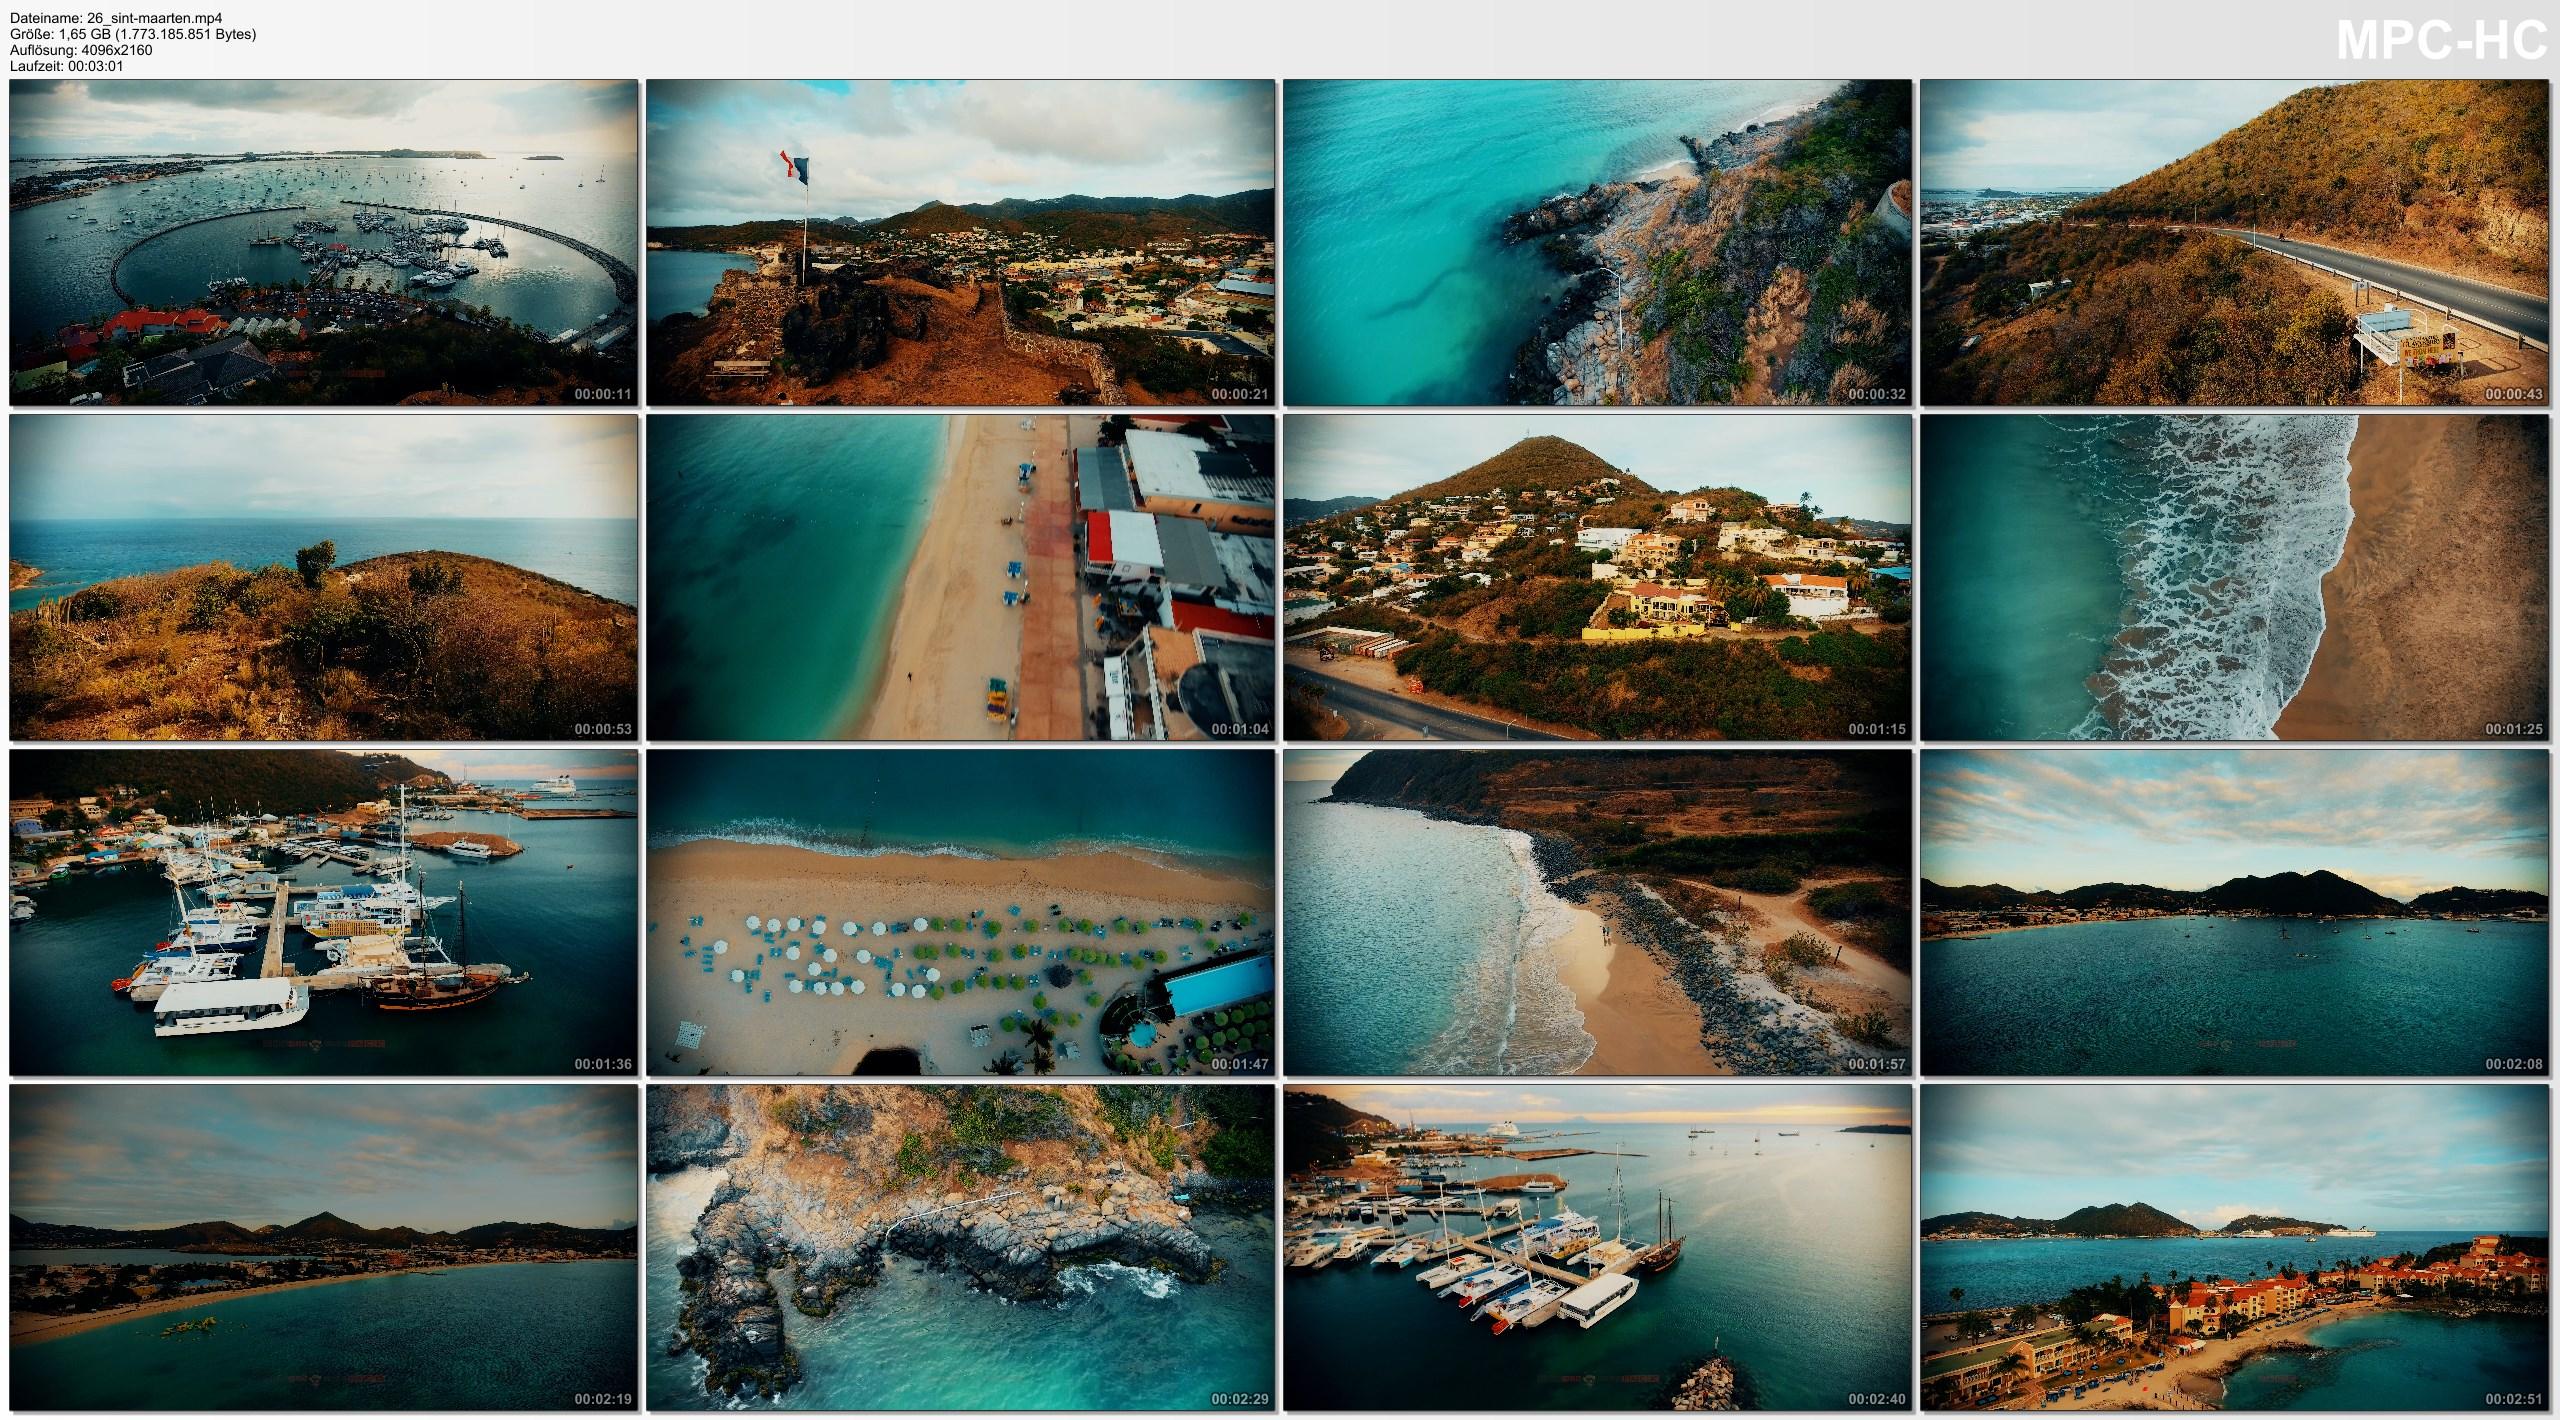 Drone Pictures from Video 4K Drone Footage SINT-MAARTEN [DJI Phantom 4]